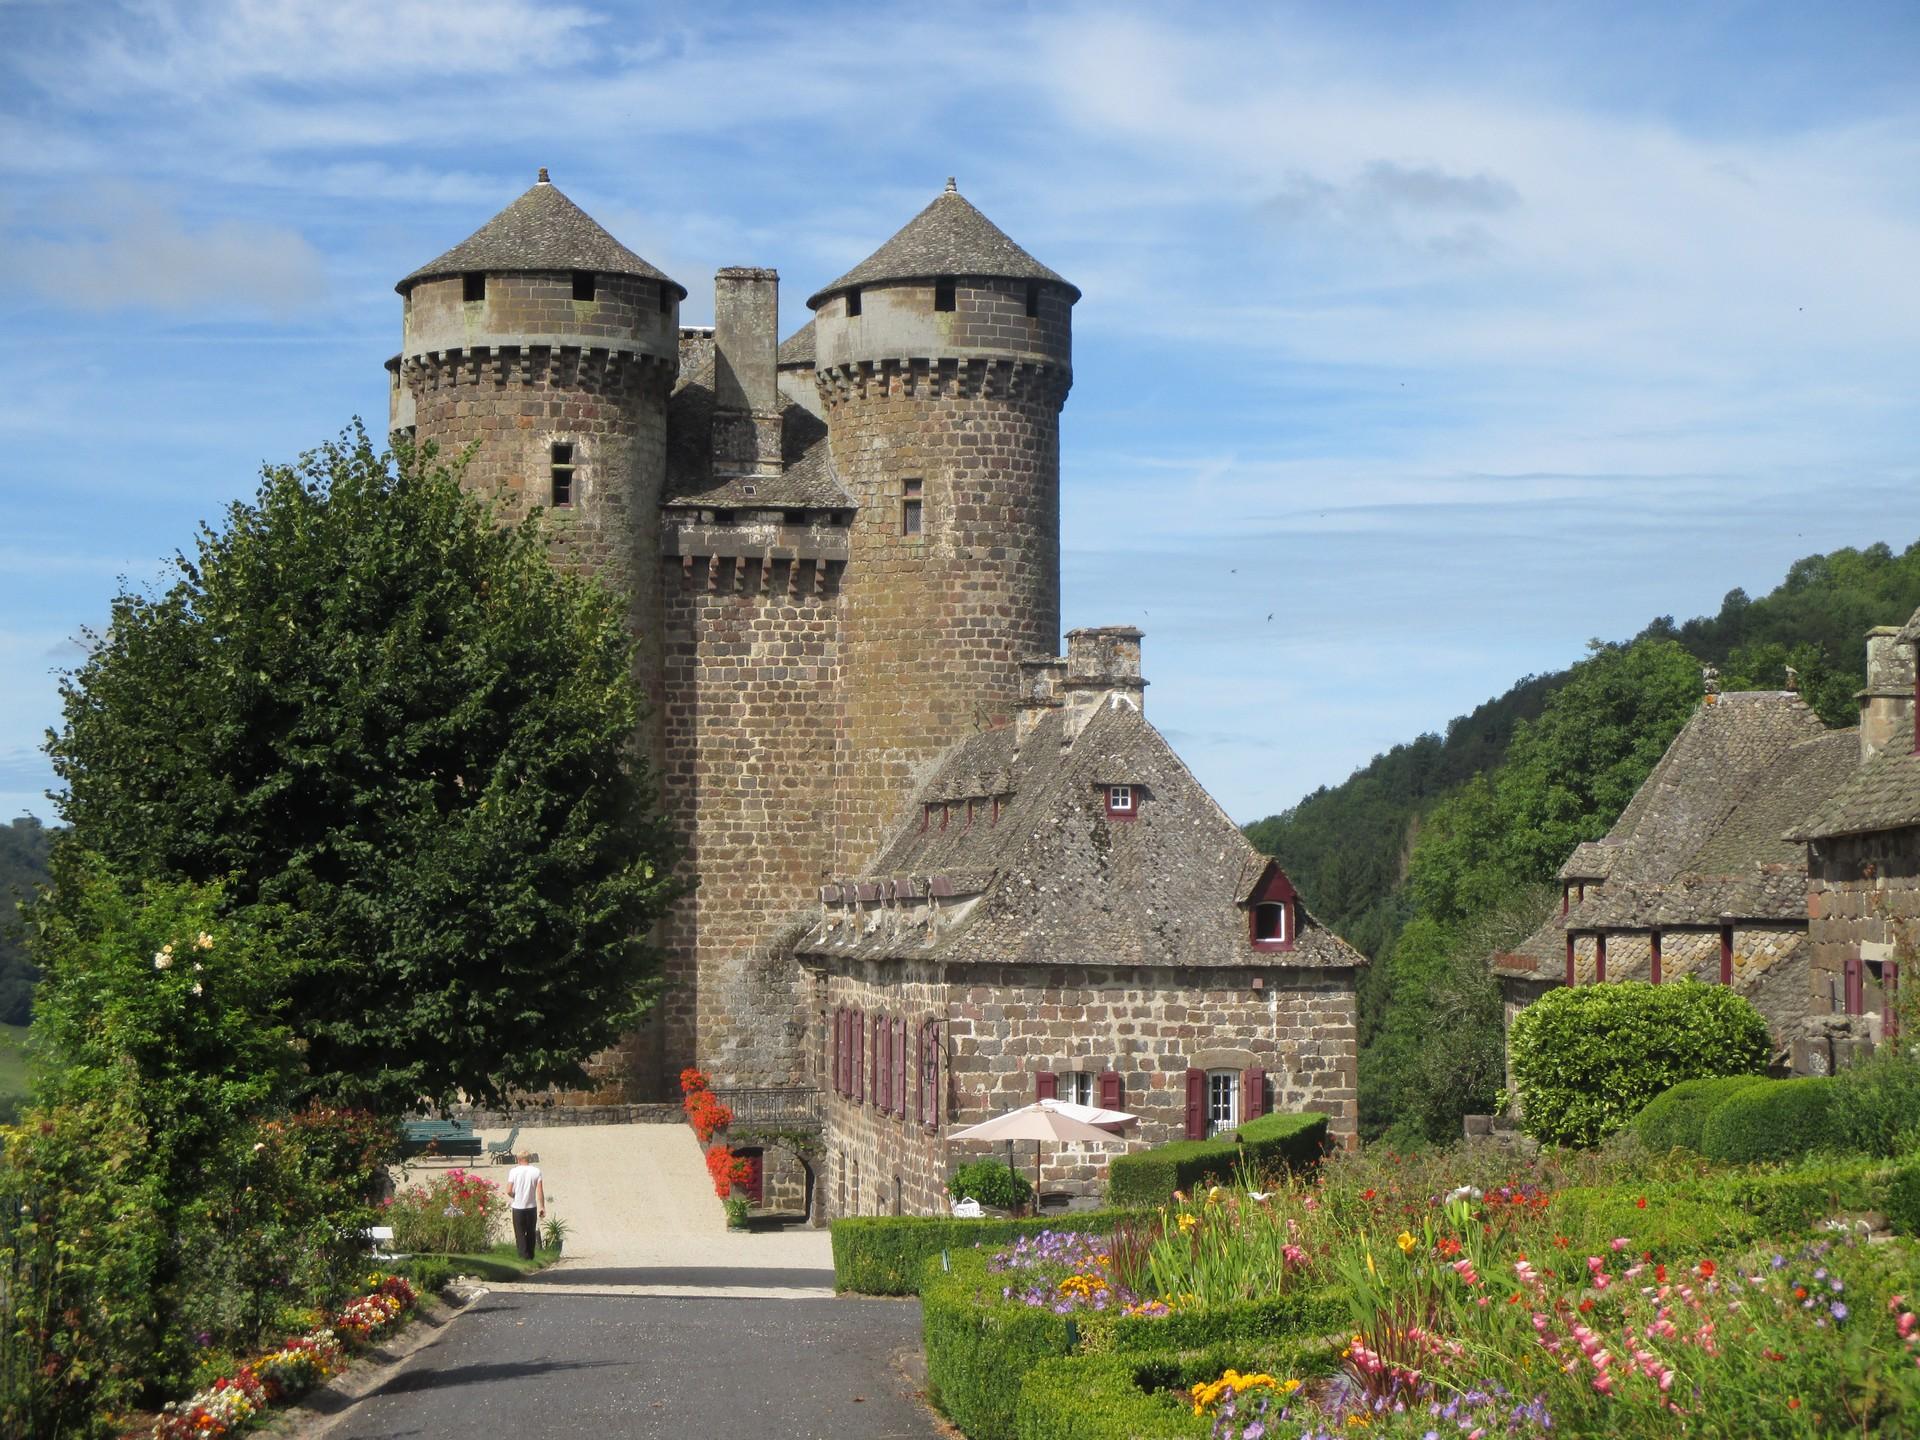 Chateau d'Anjony à Tournemire